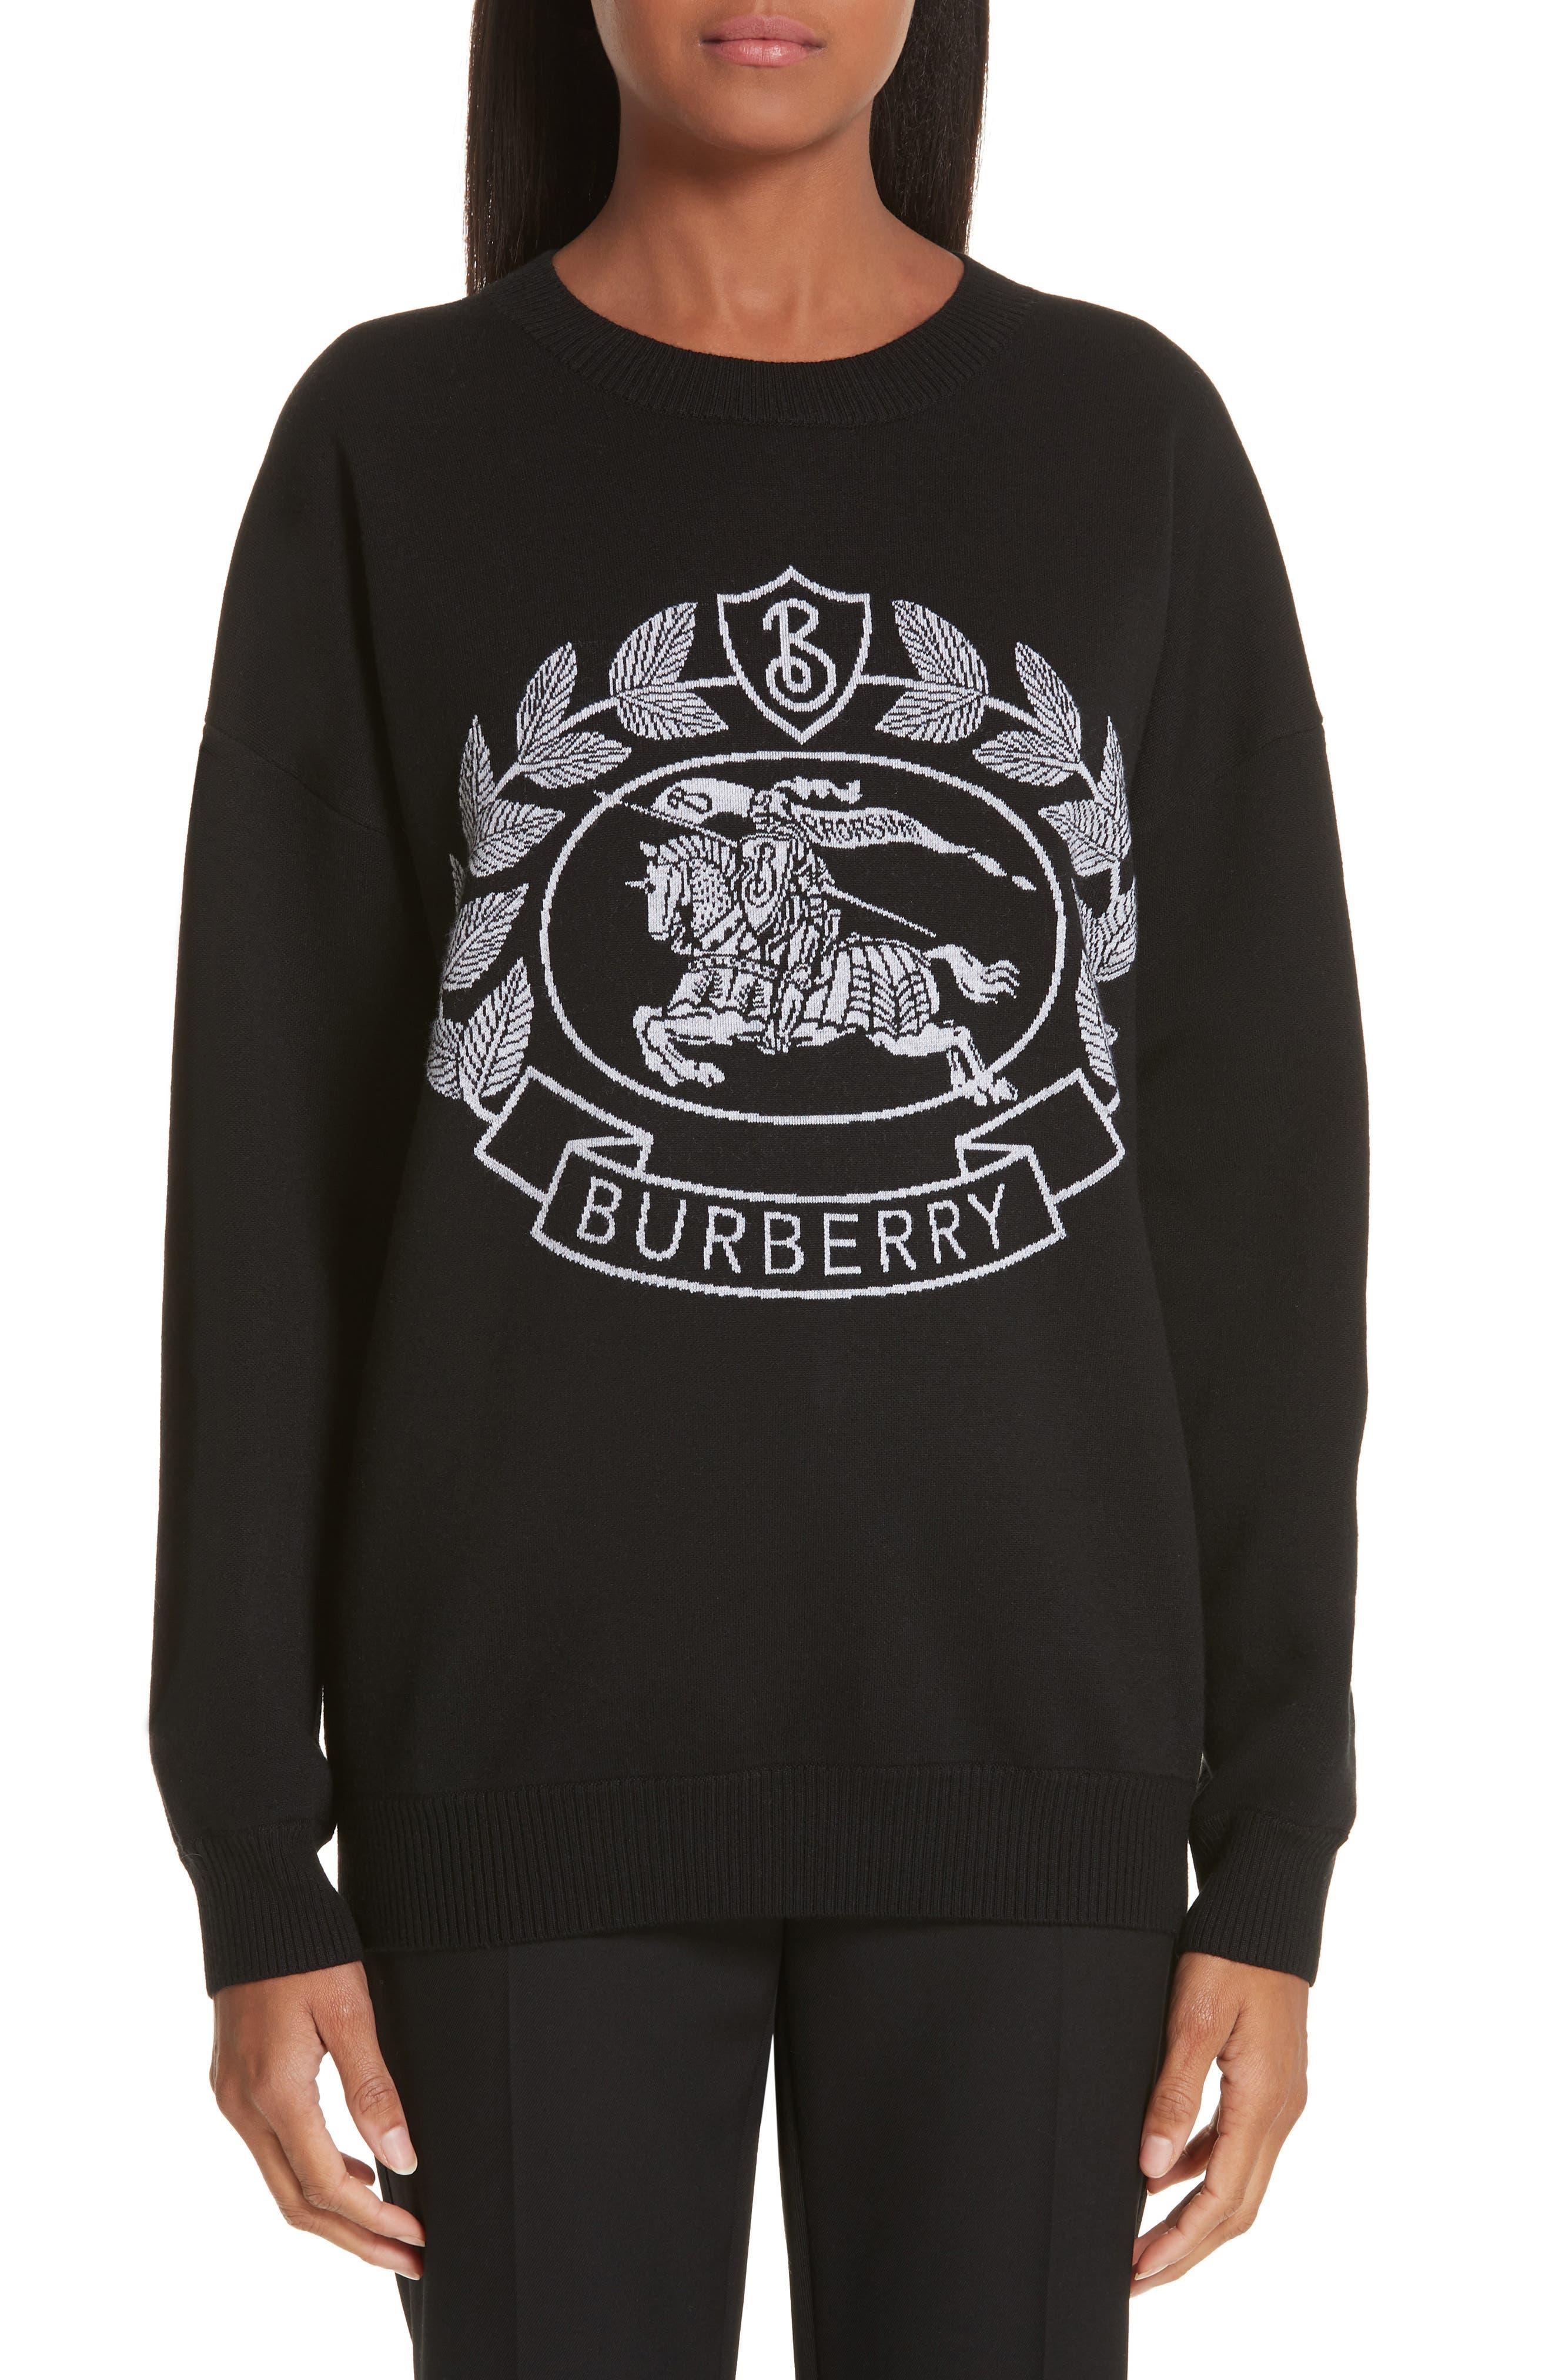 Burberry Bilston Logo Jacquard Merino Wool Blend Sweater, Black